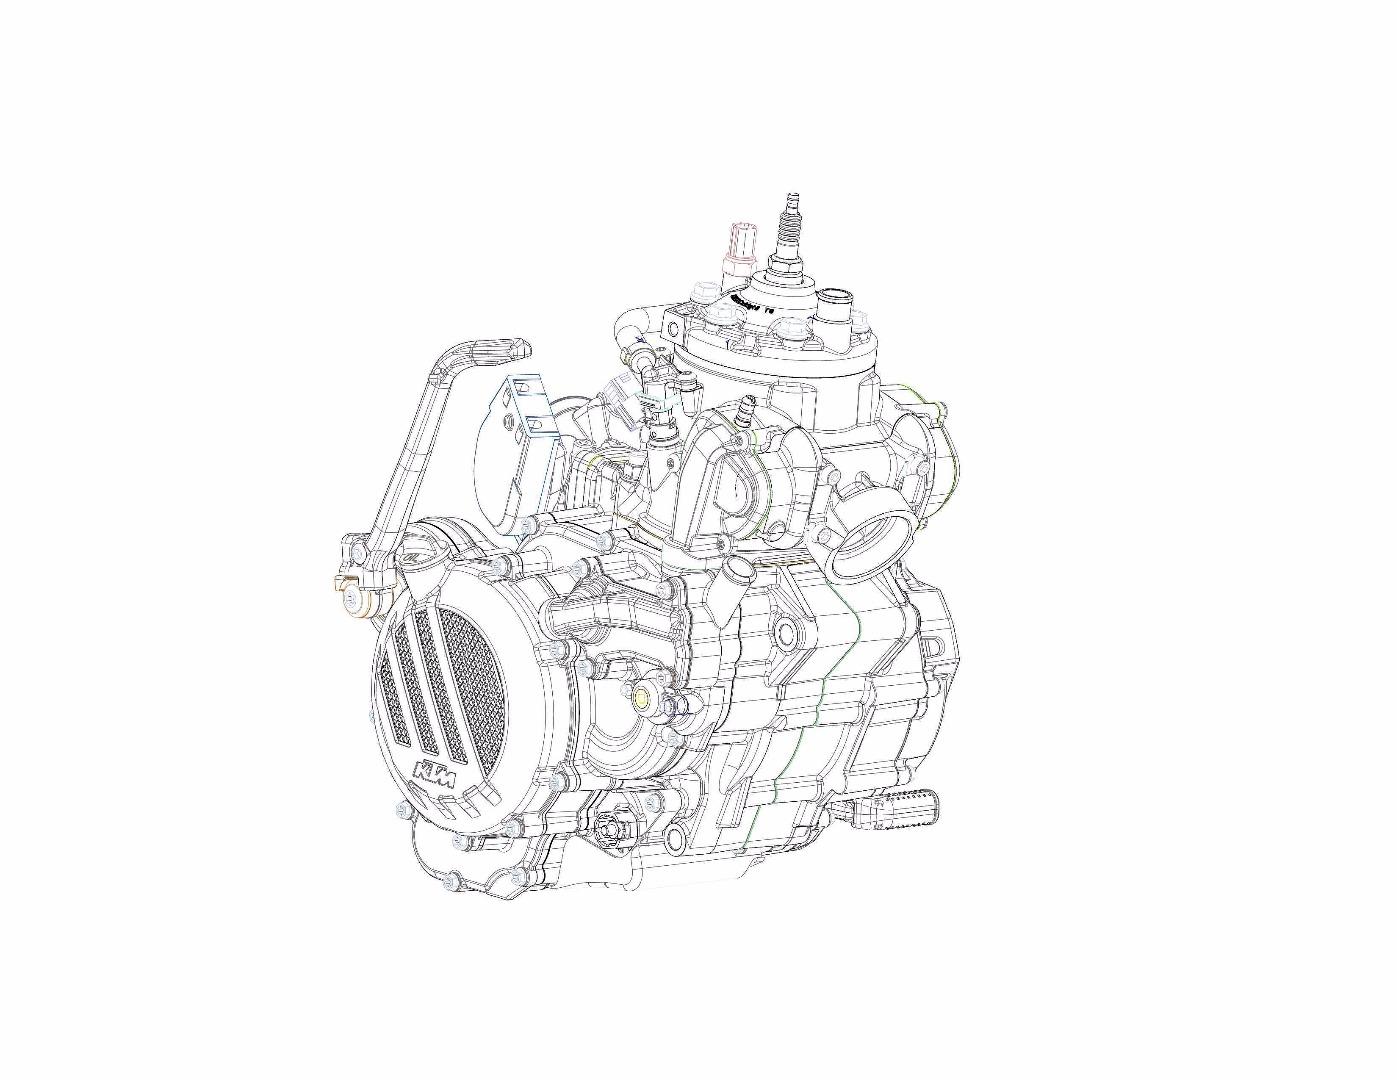 KTM announces new fuel injected two-stroke Enduro range